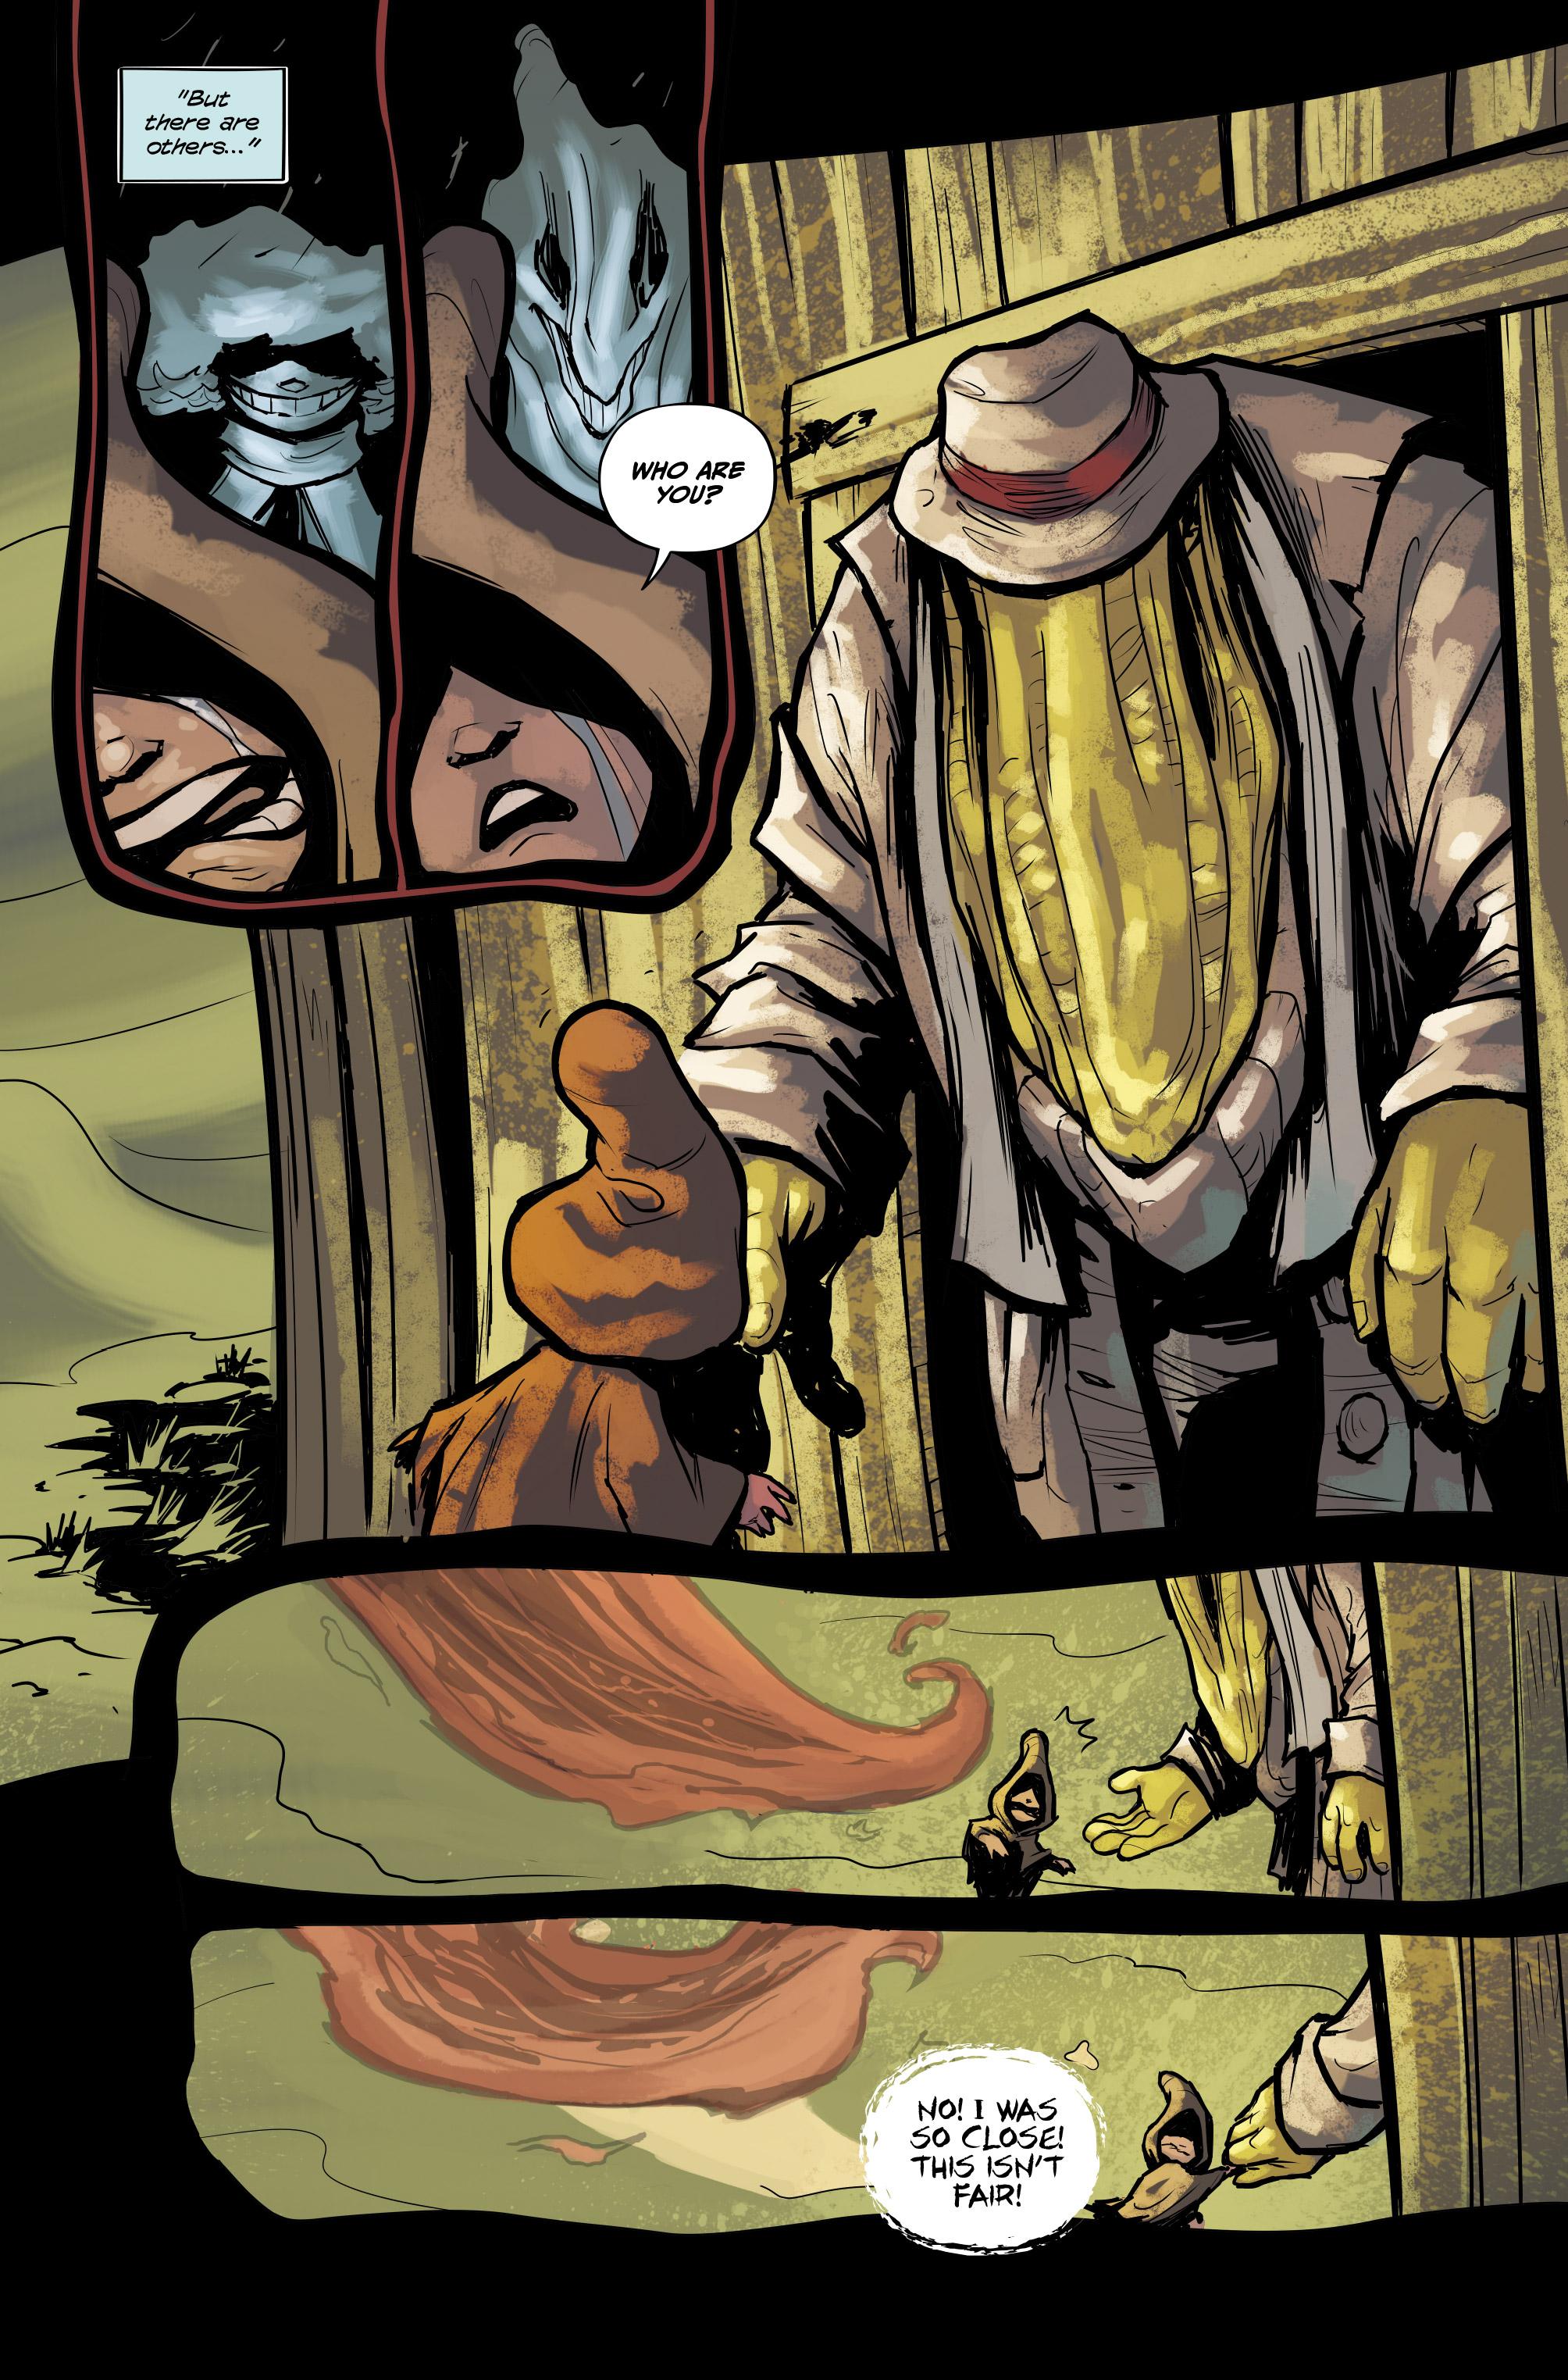 Read online Little Nightmares comic -  Issue #1 - 23